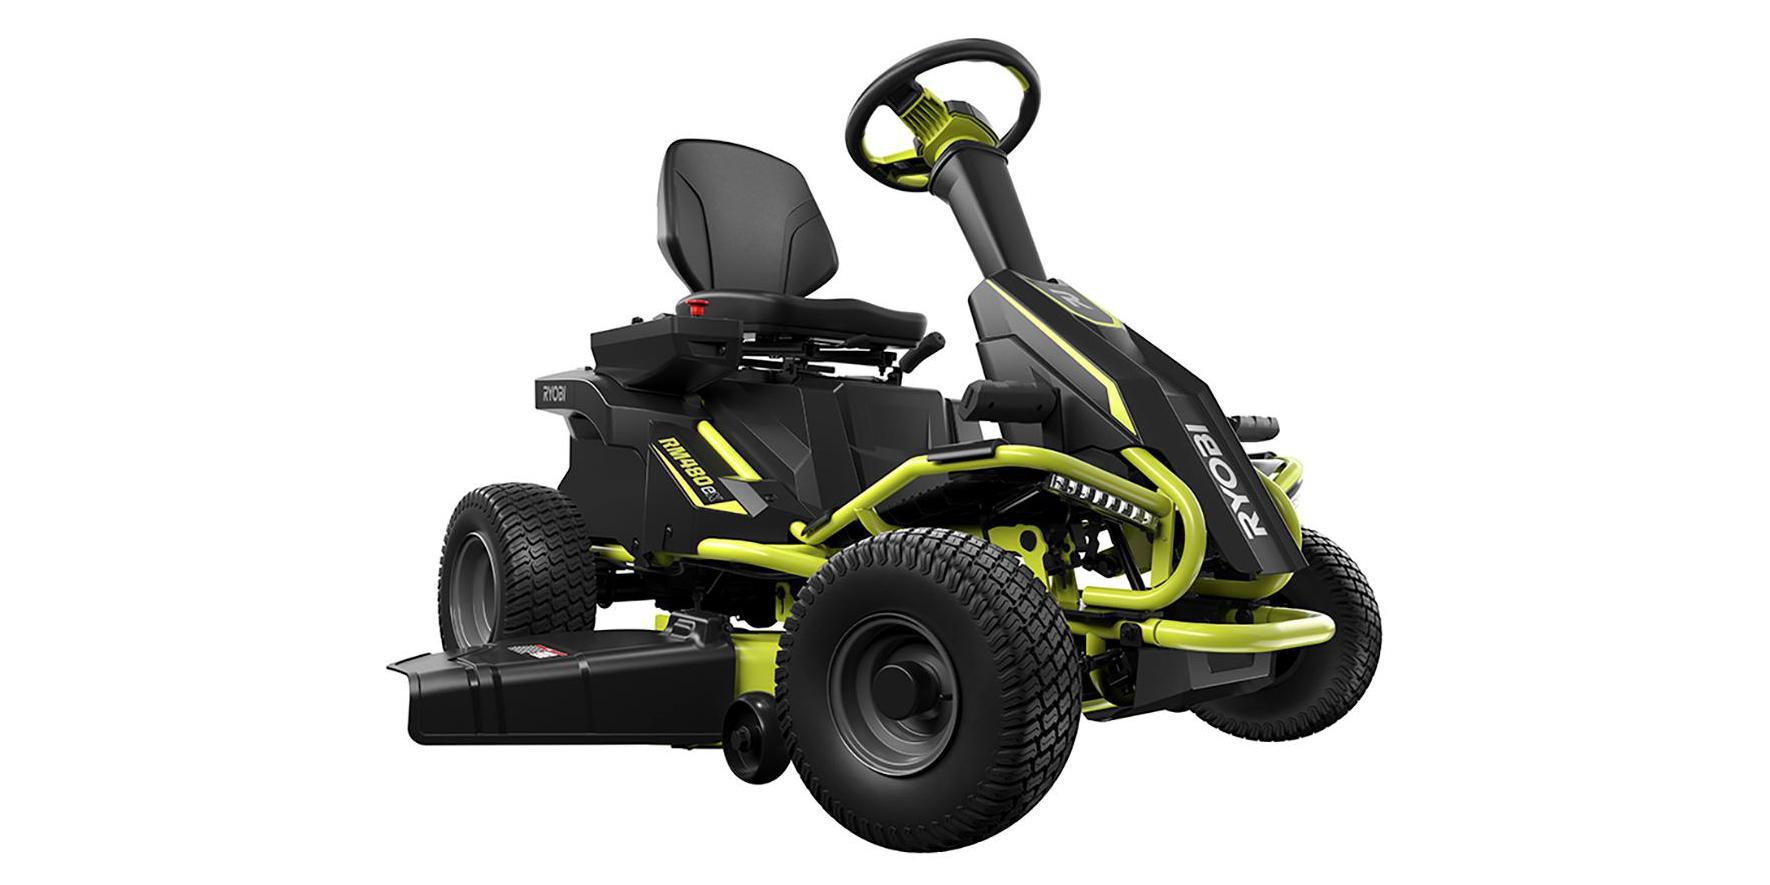 Green Deals Ryobi 38 Inch 100ah Electric Riding Lawn